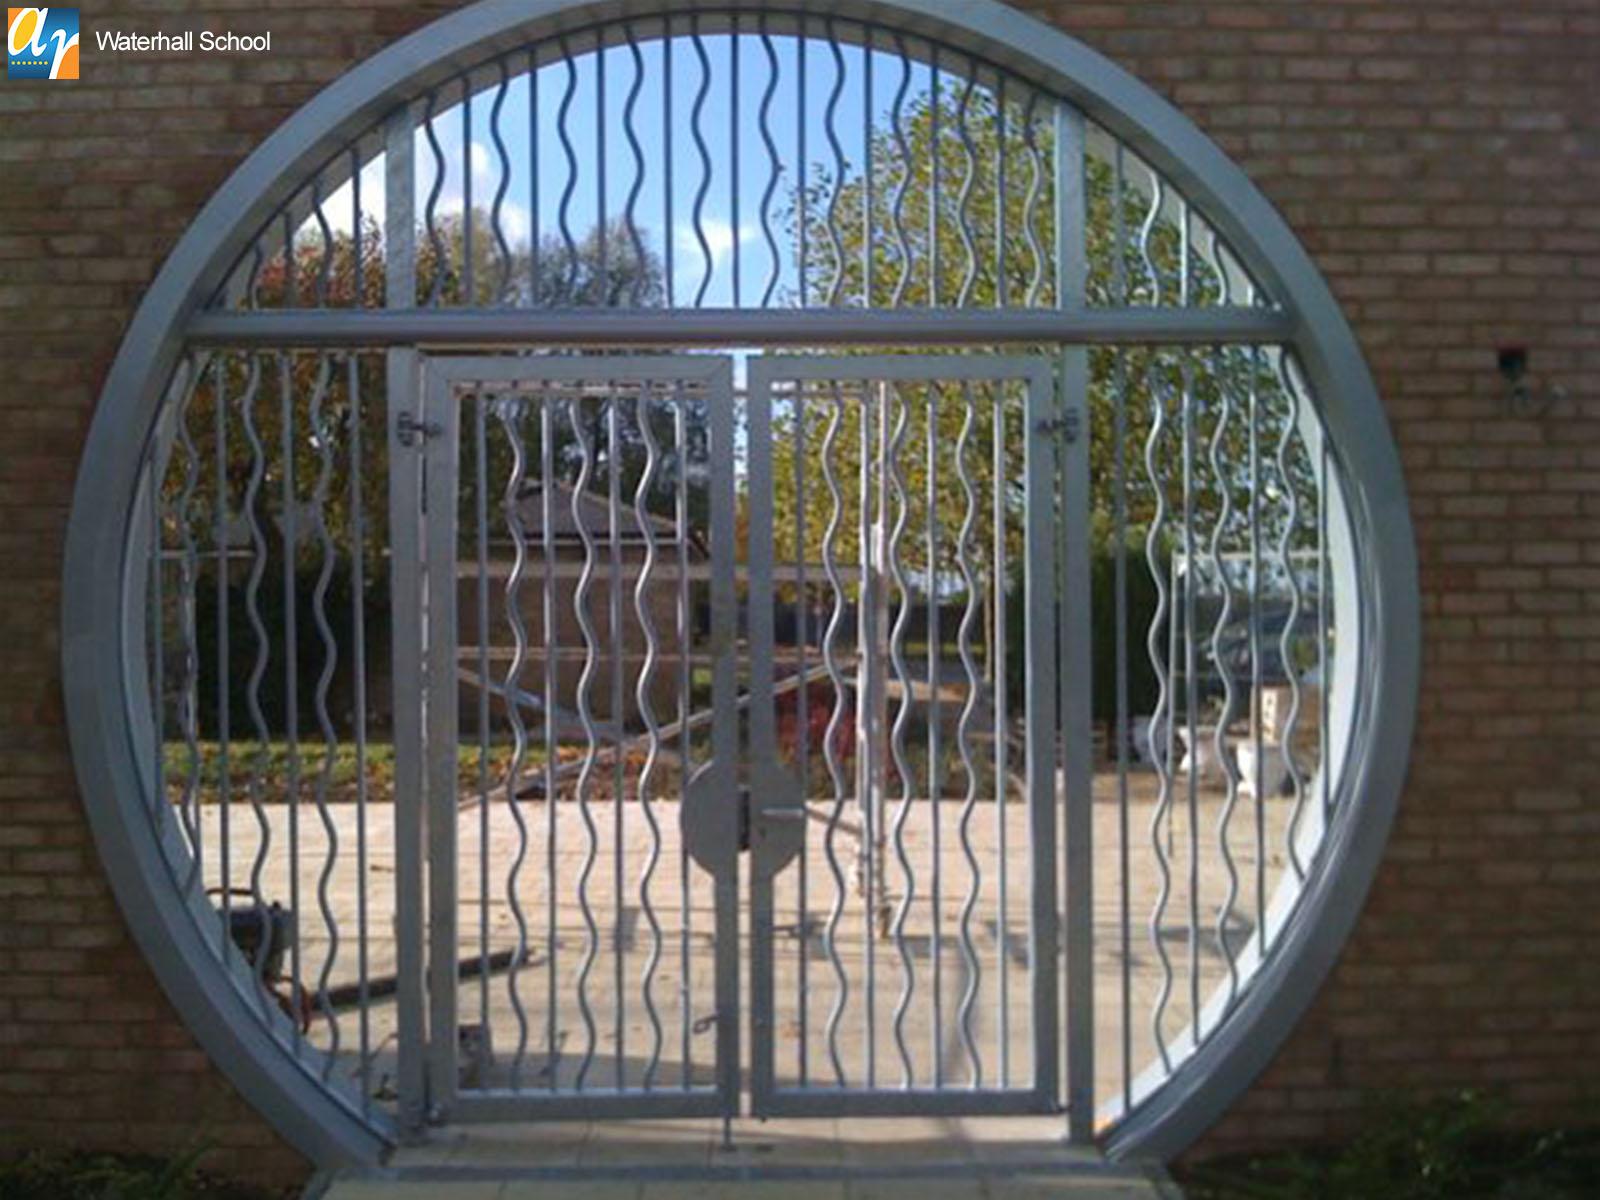 Waterhall School metal gates